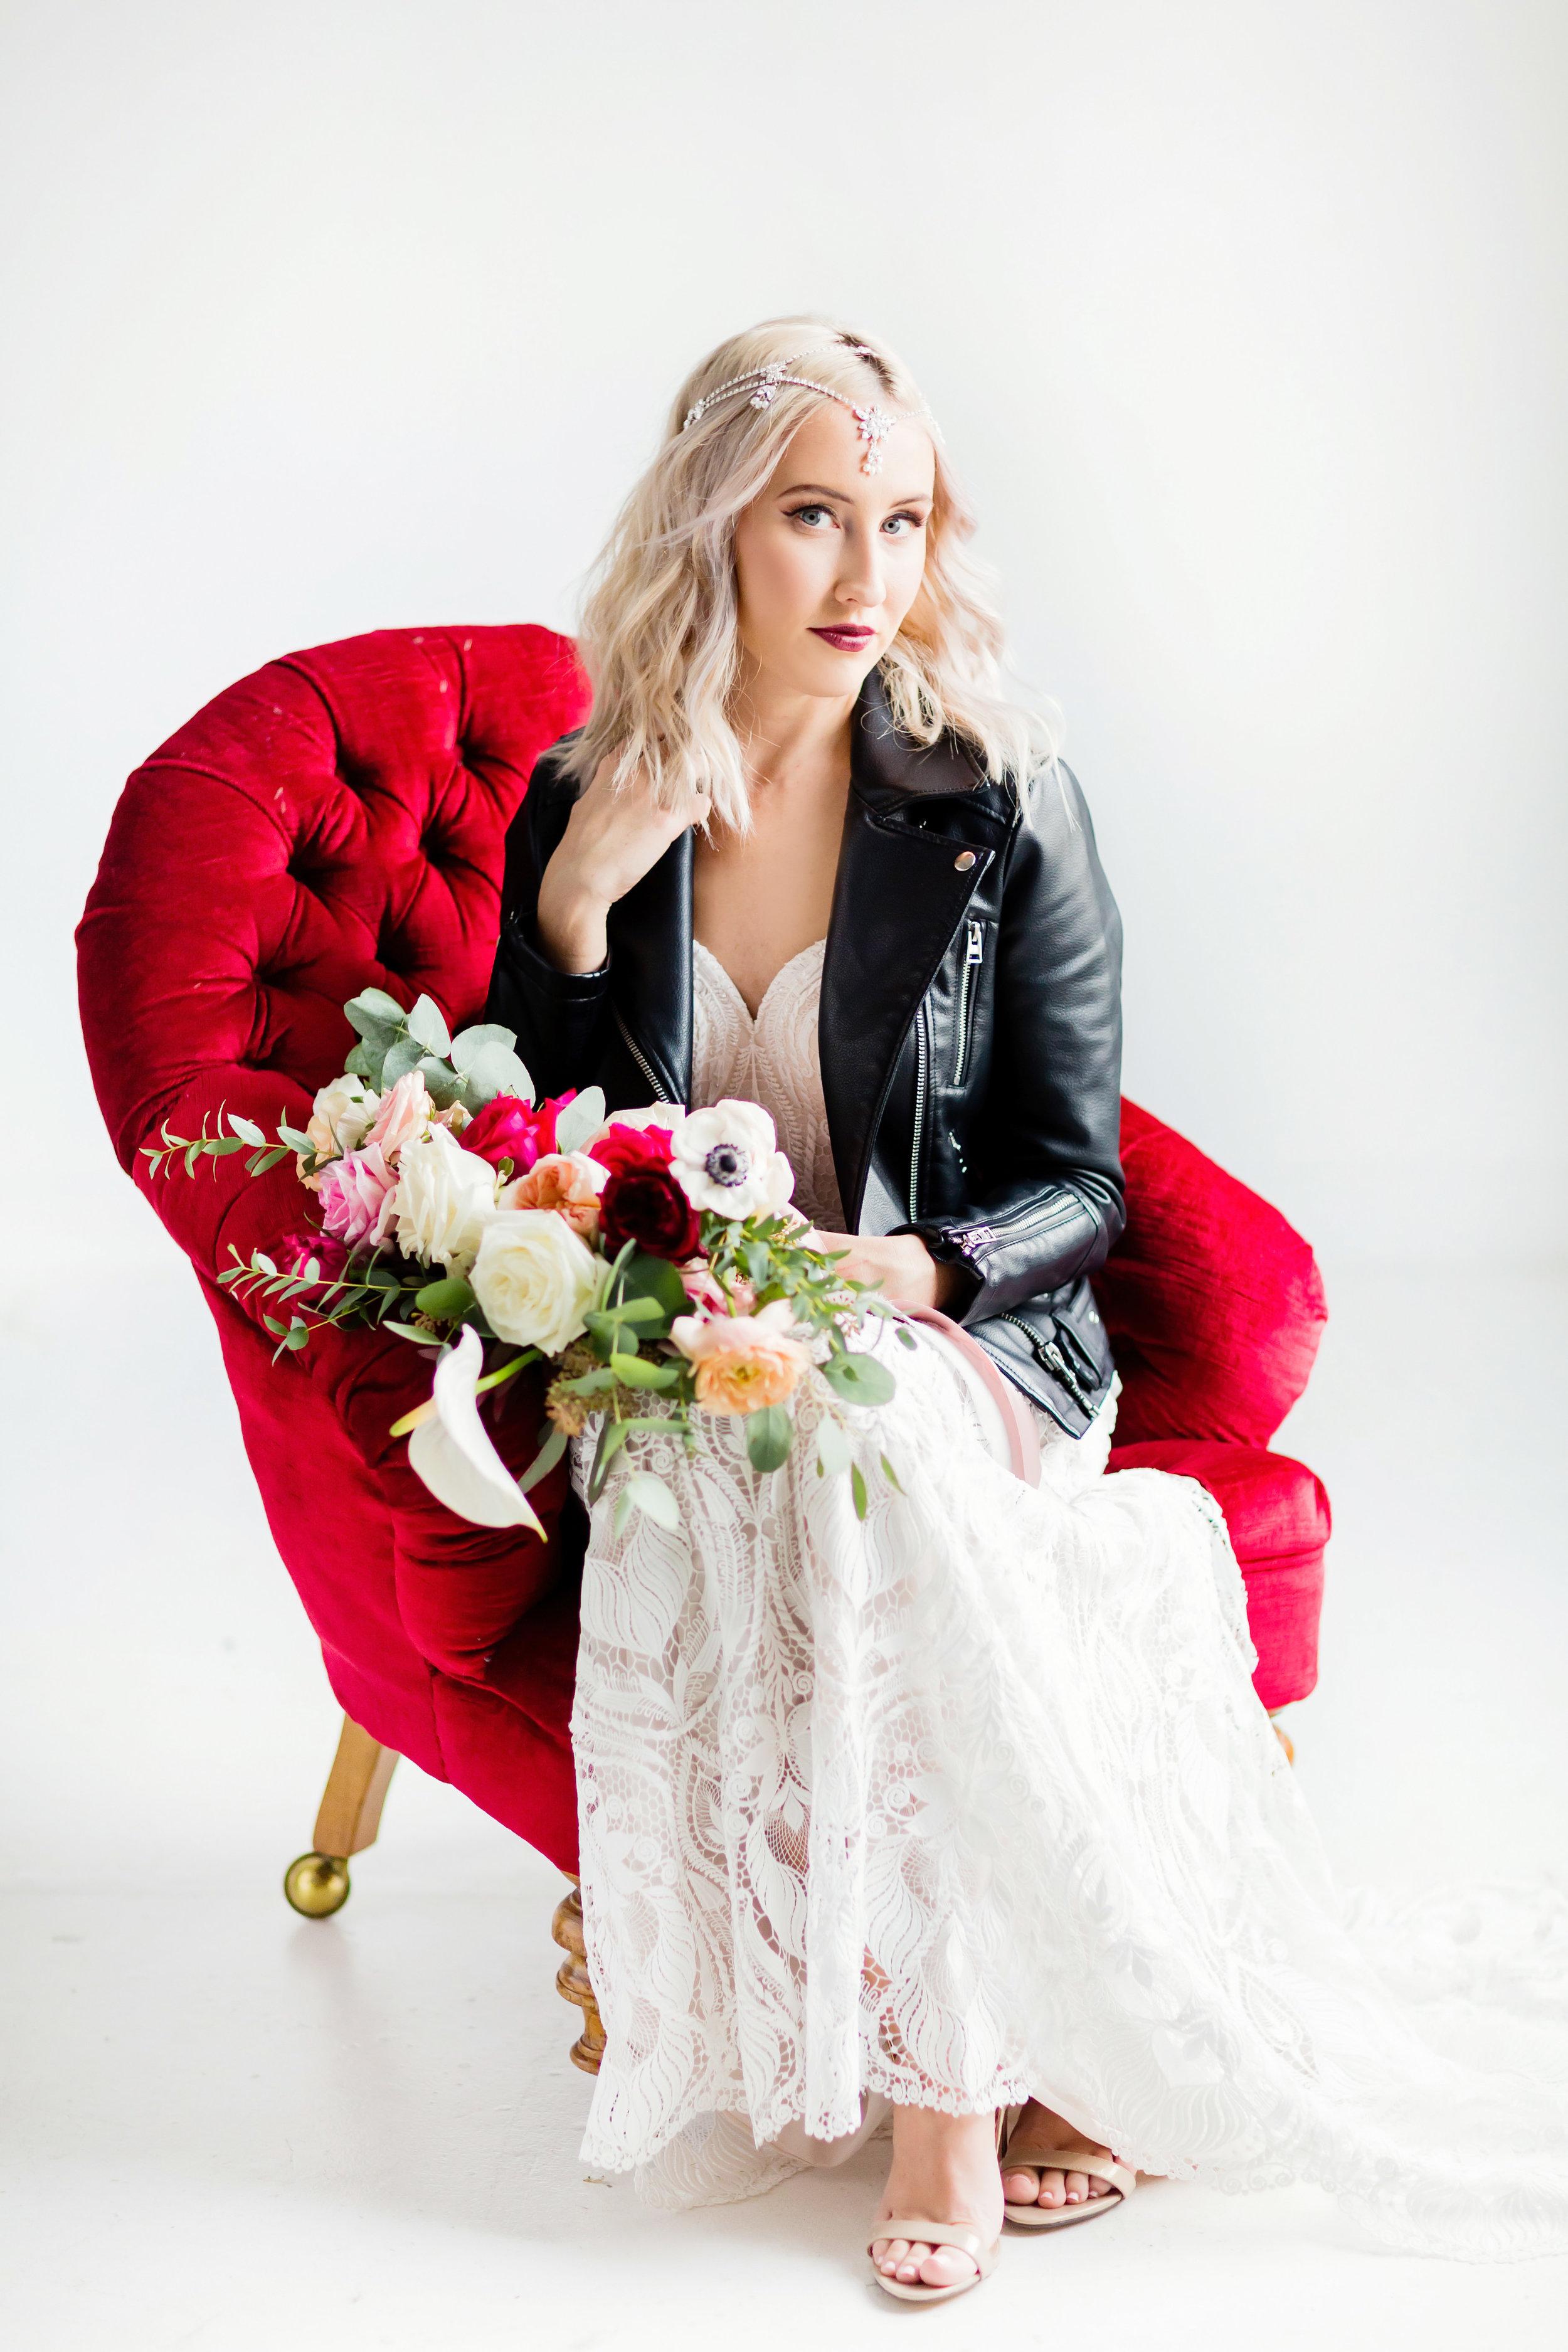 bridal-editorial-photographer-toronto-eryn-shea-photography-14.jpg